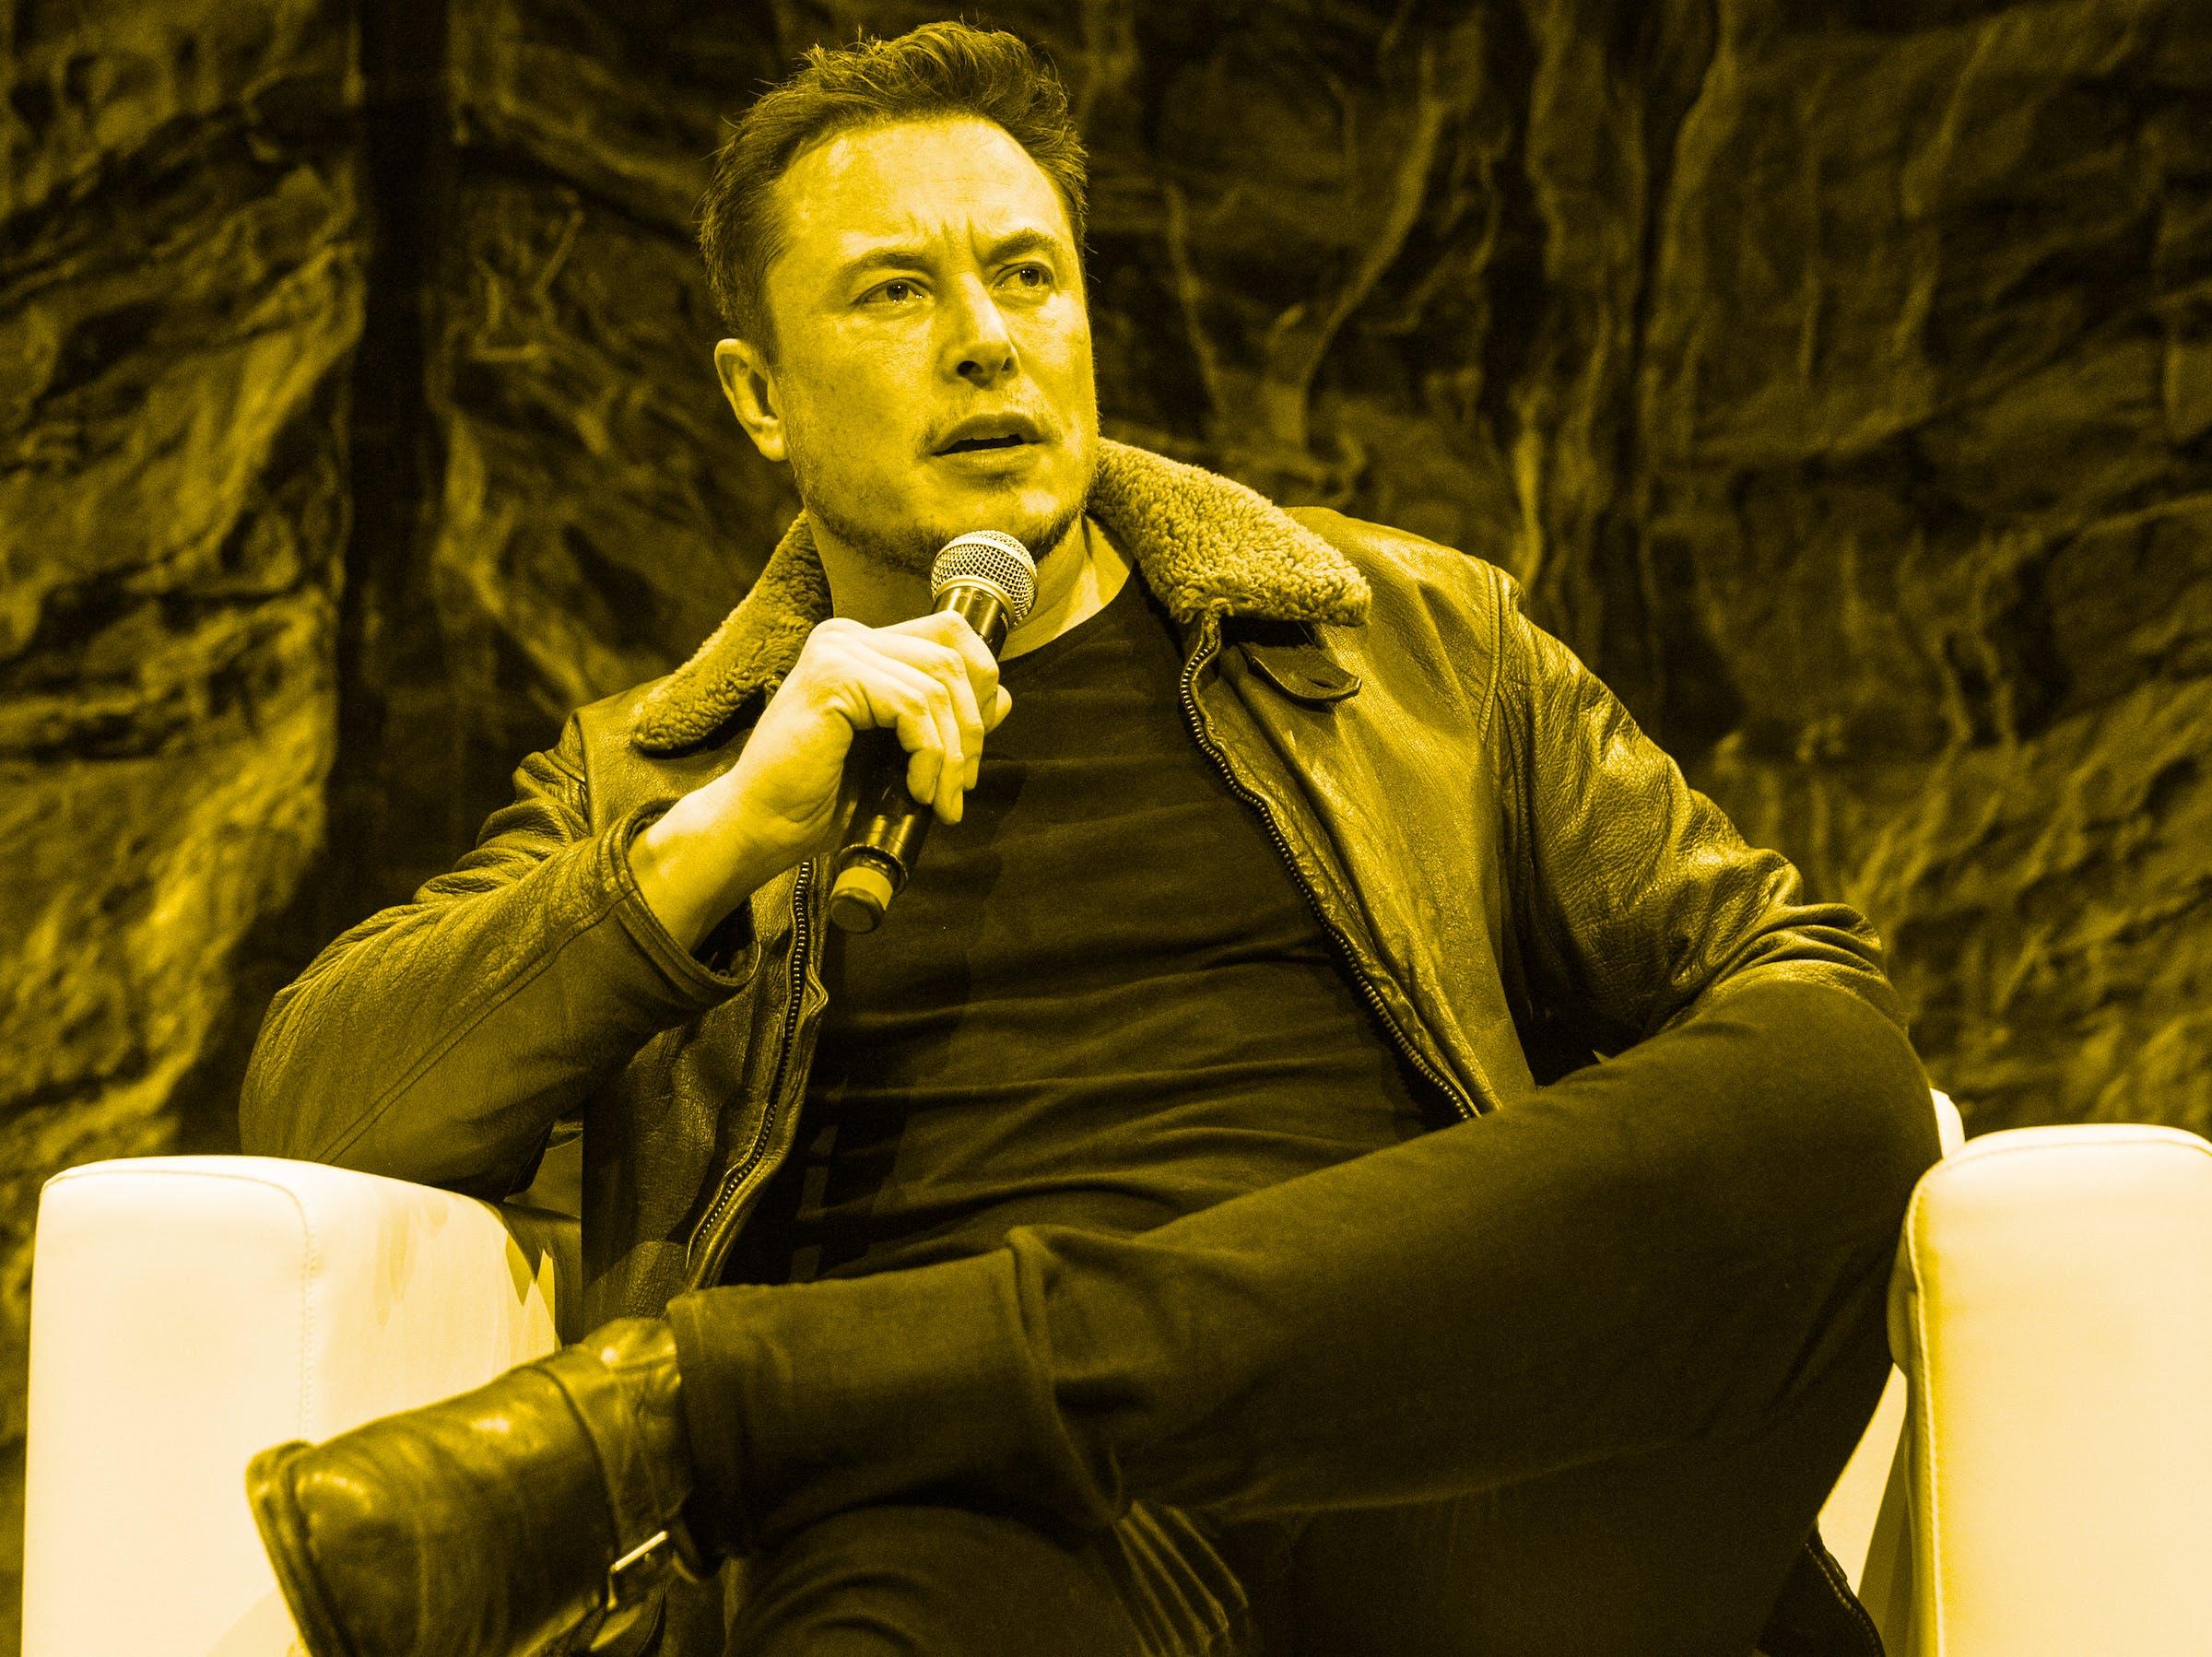 Elon Musk at SXSW 2018